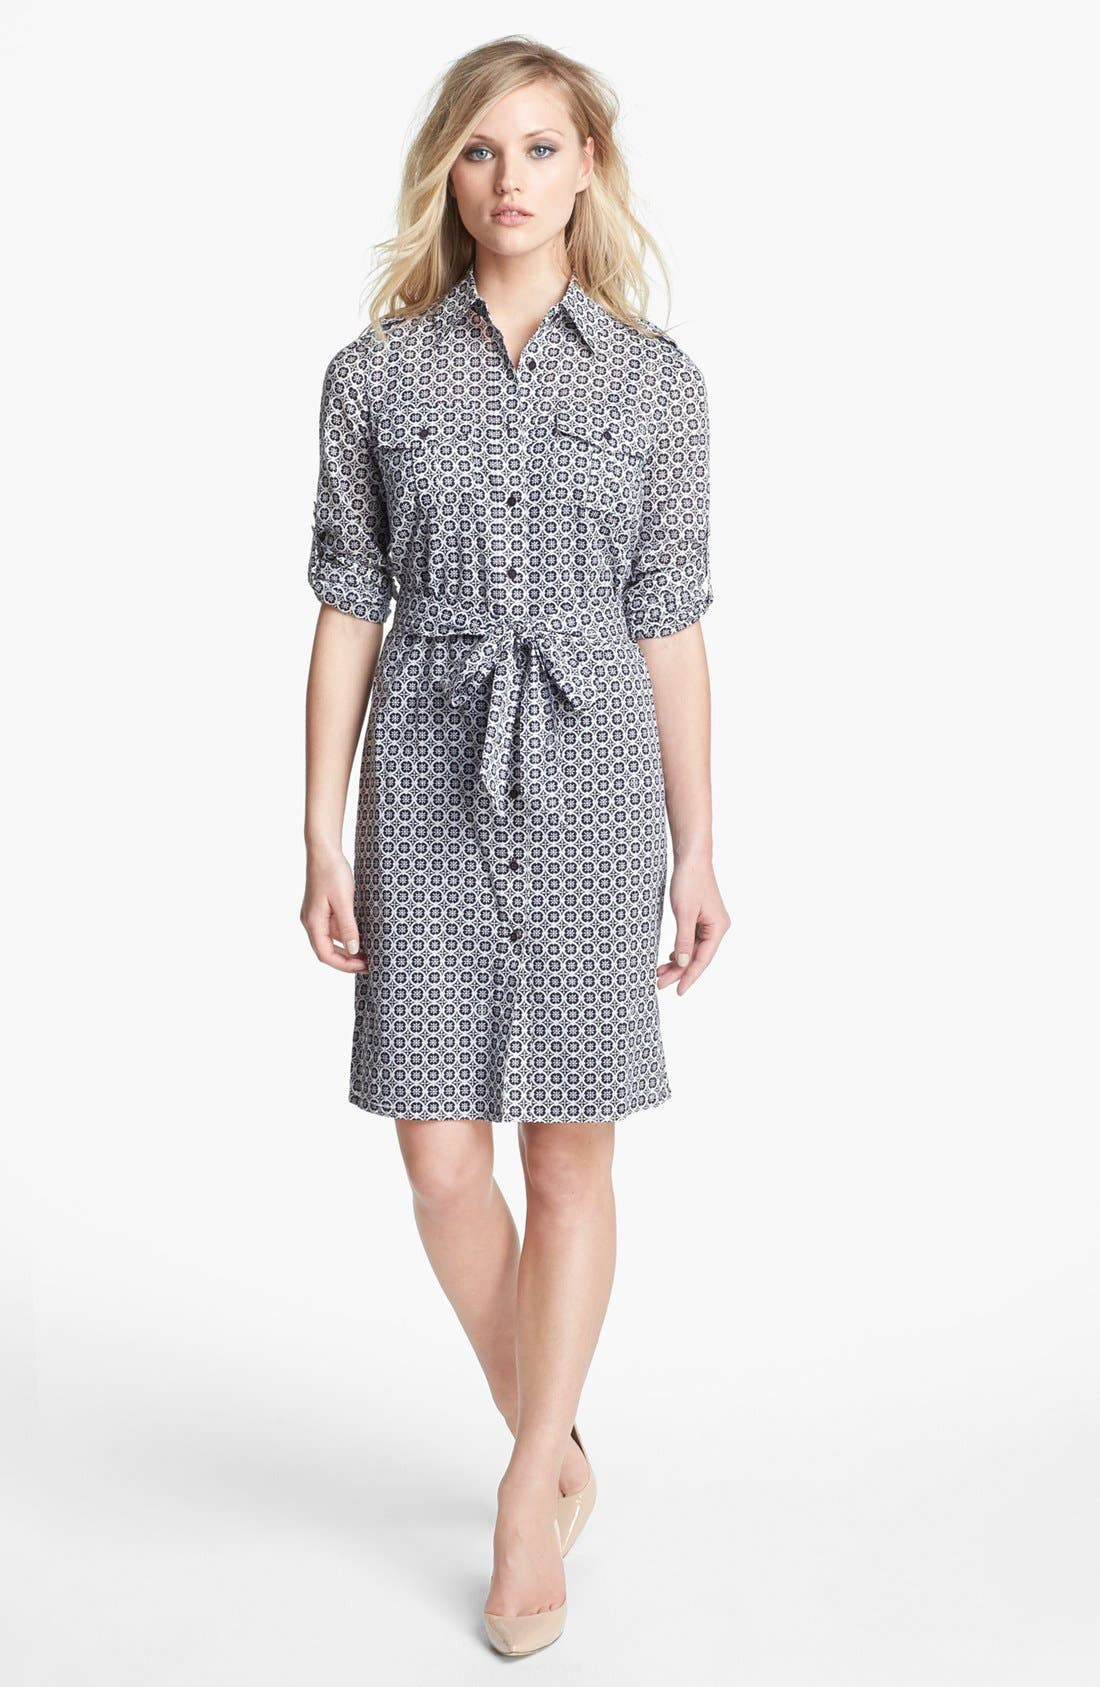 Alternate Image 1 Selected - Tory Burch 'Brigitte' Cotton Shirtdress